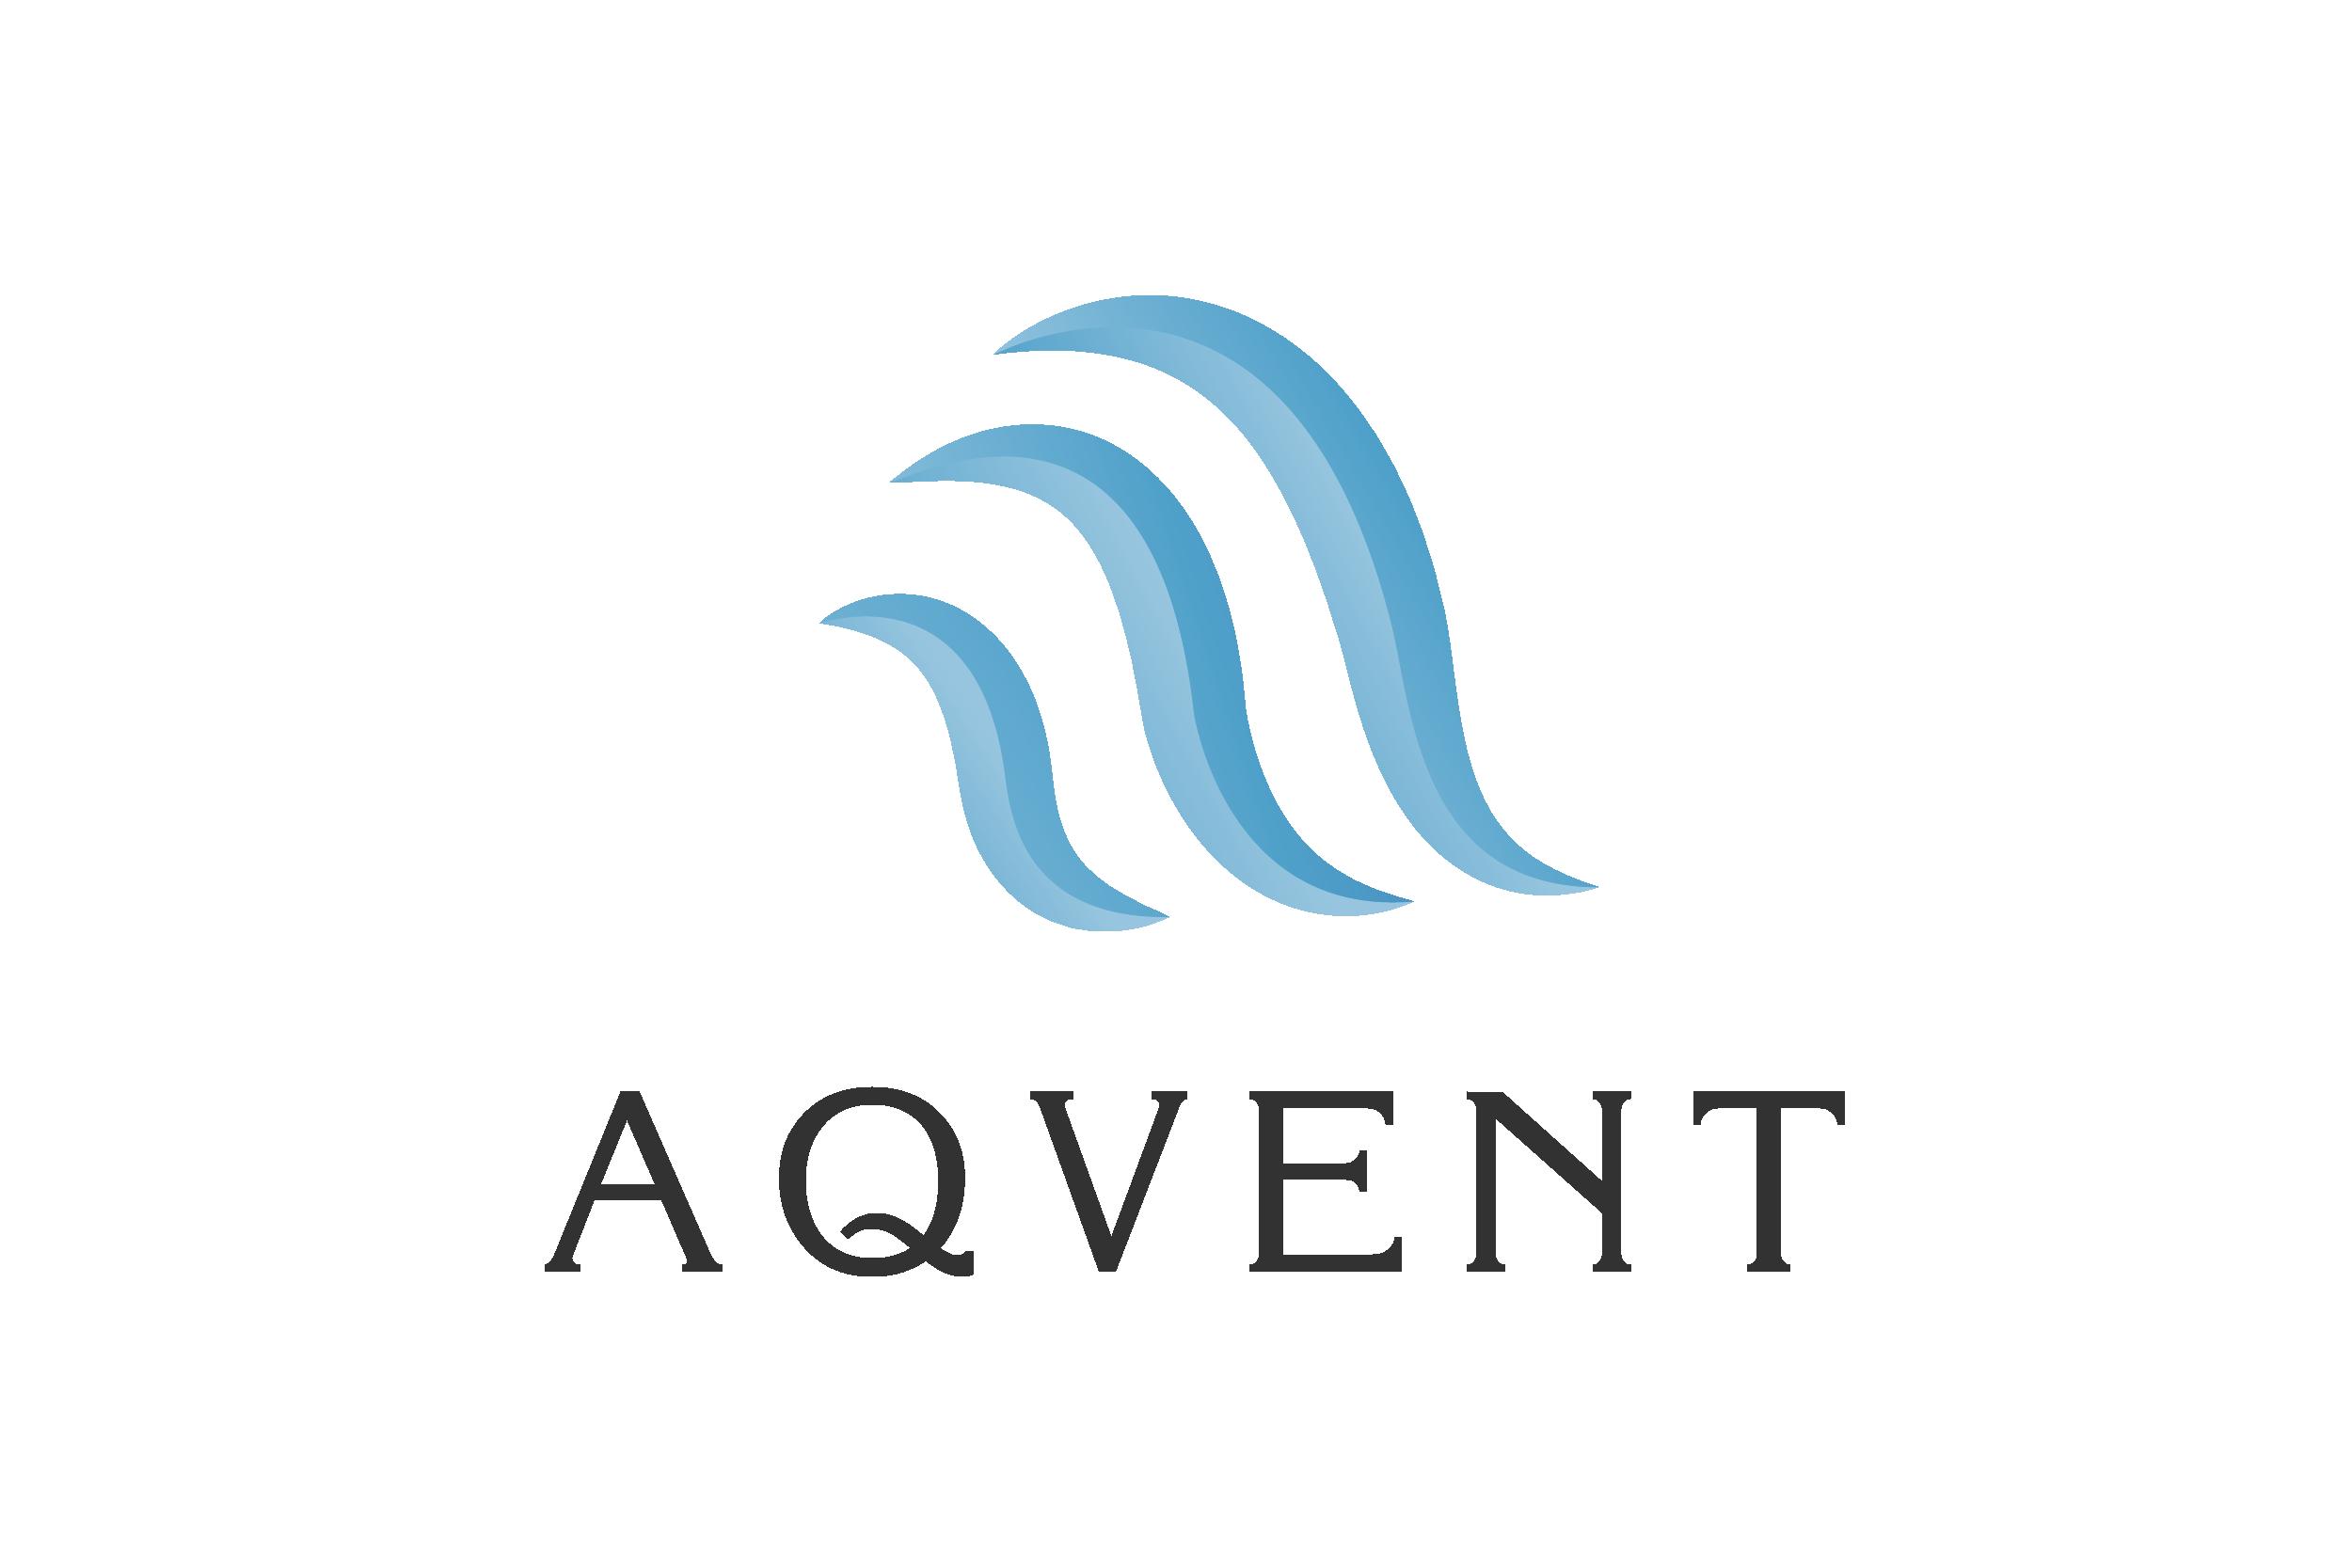 Логотип AQVENT фото f_481528d0a530ef7b.png